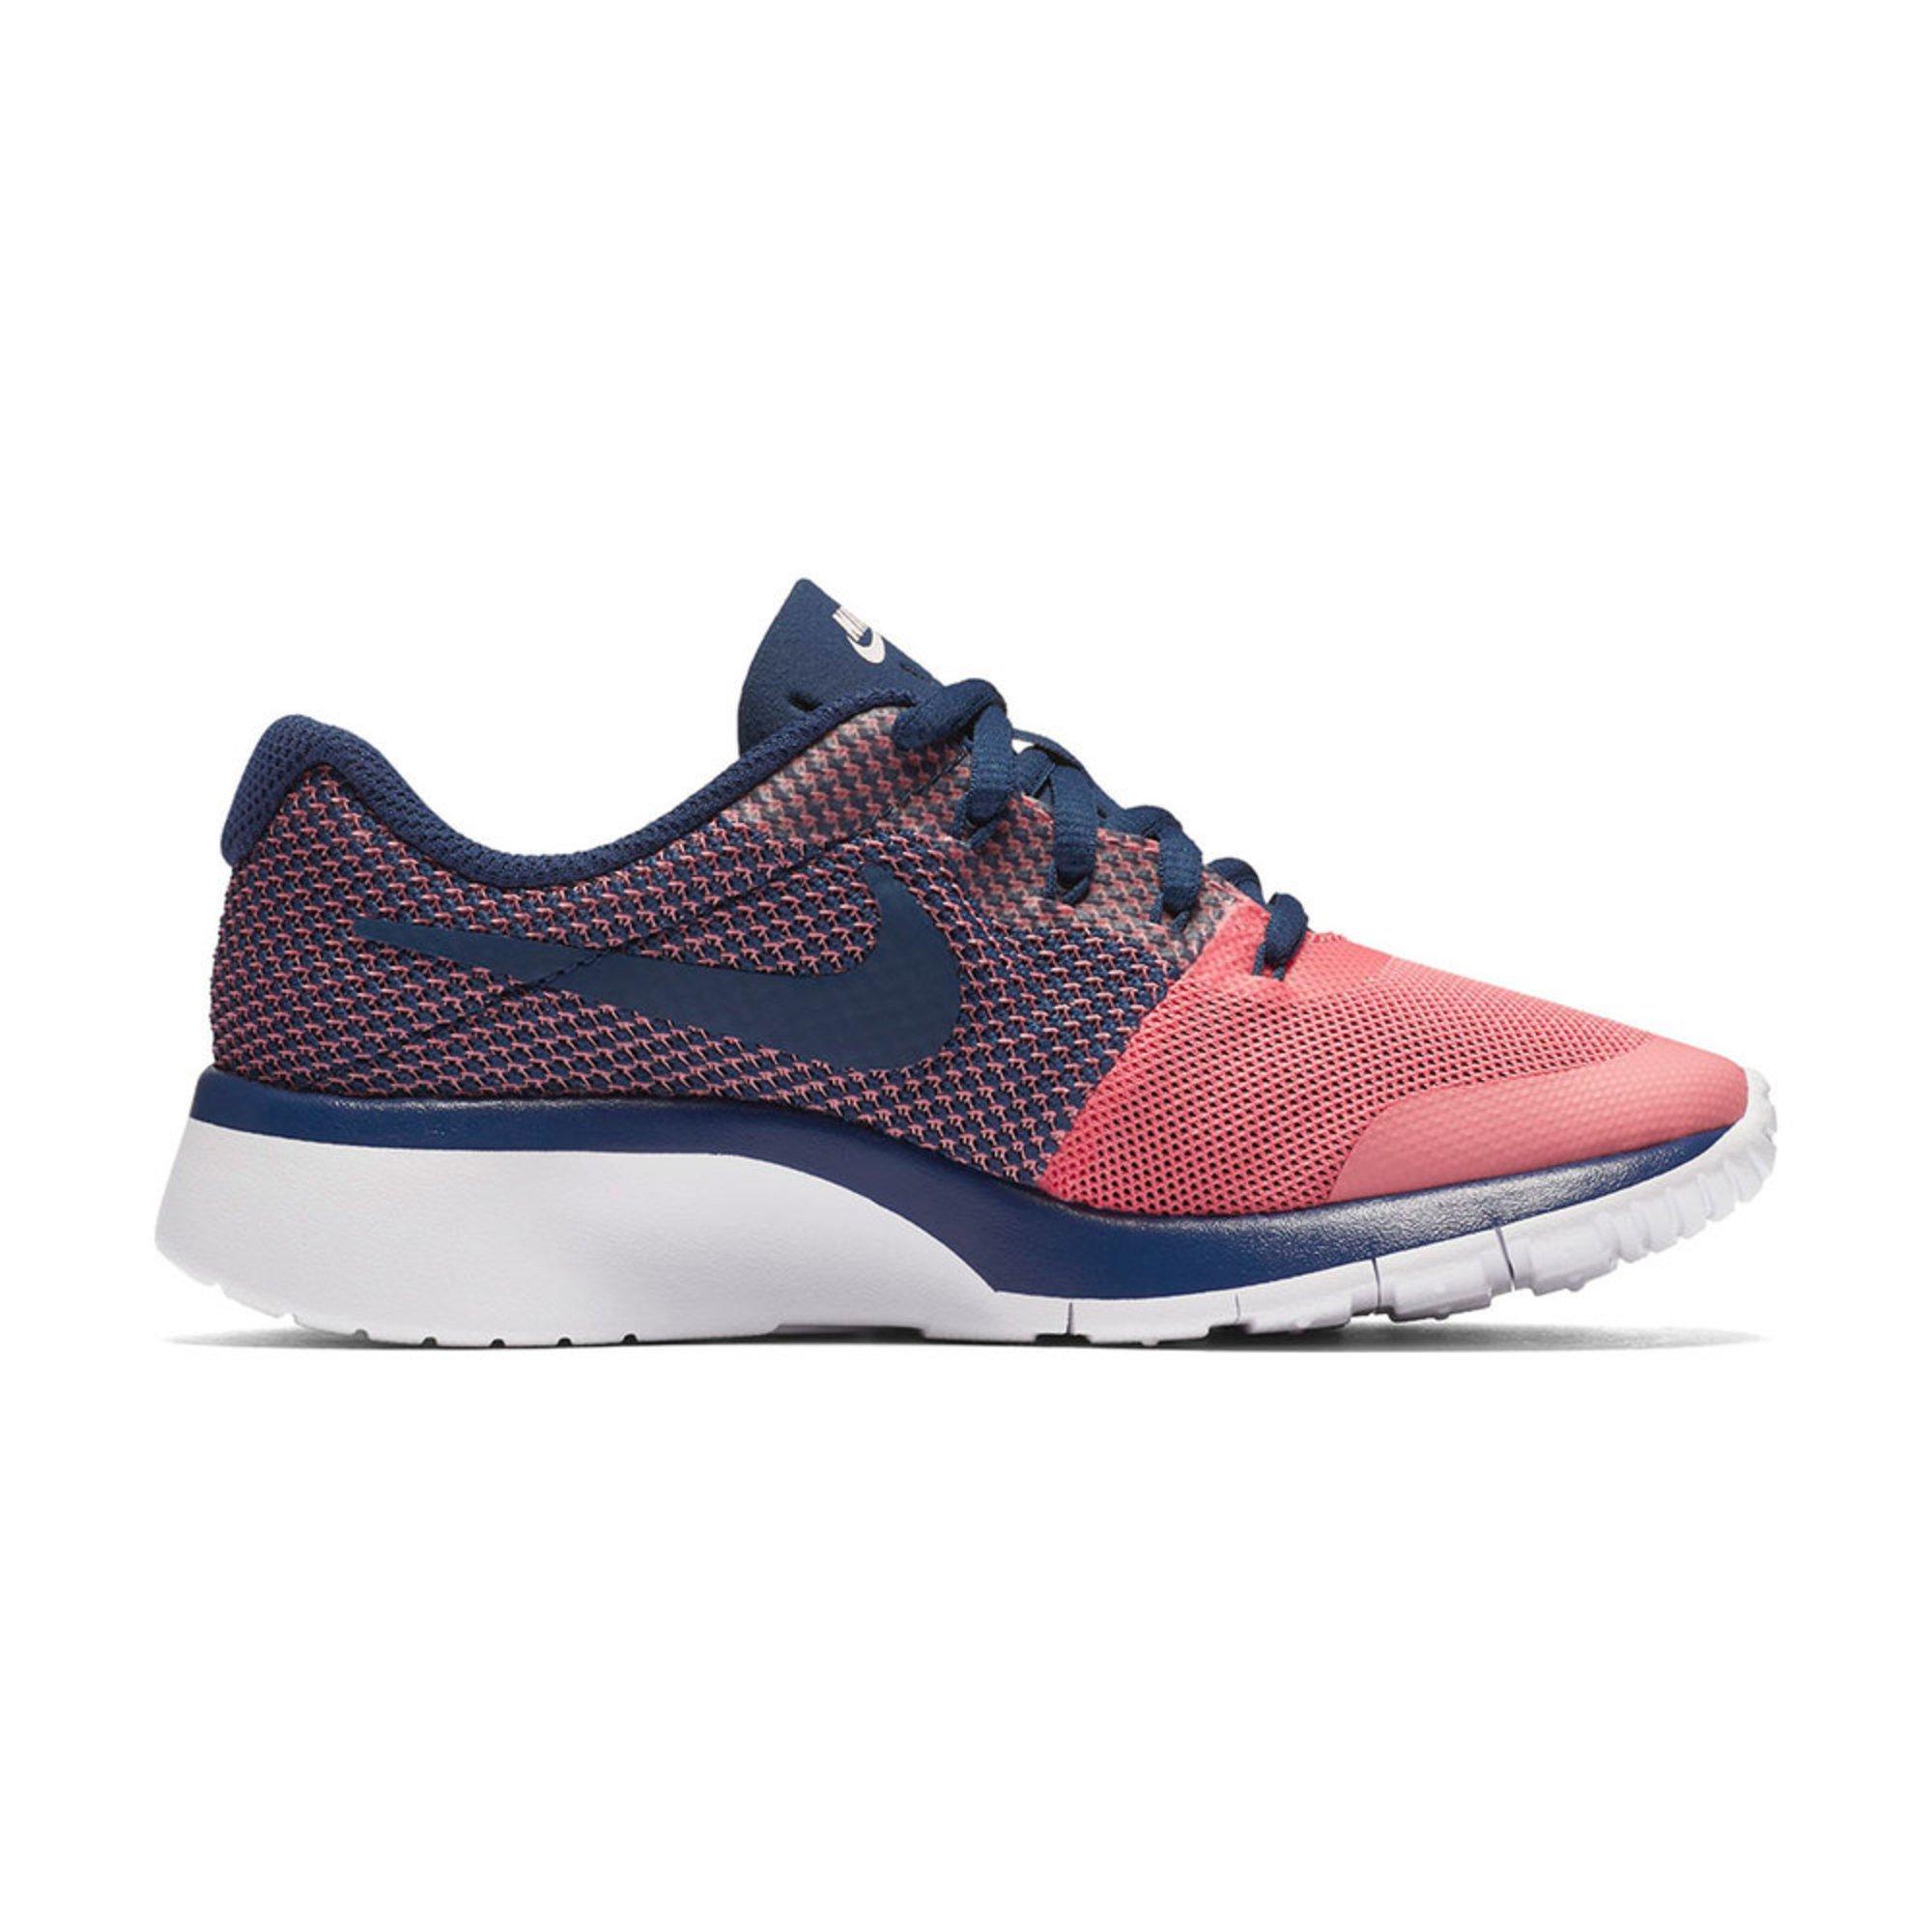 Nike Shoes Nike Tanjun 10 5 3 Boys Sports Shoes Black/White